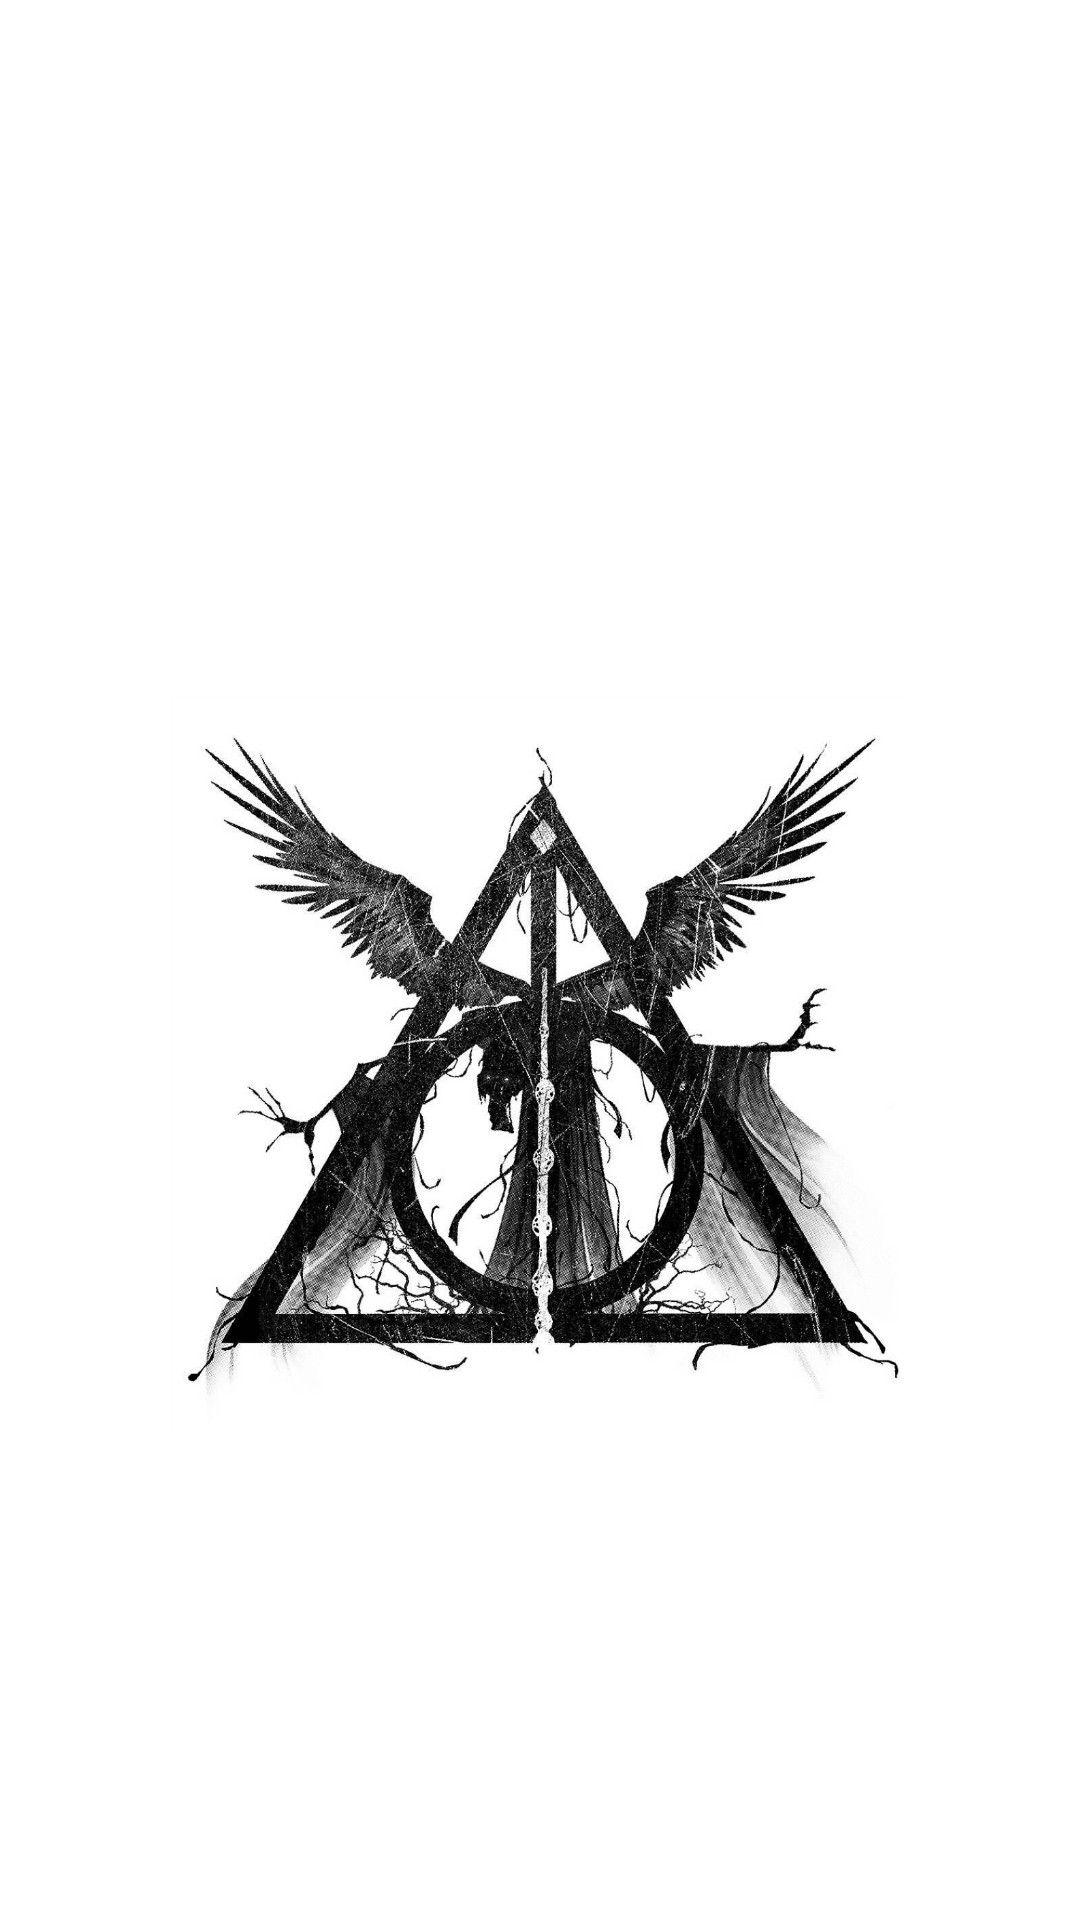 Pin Von Isabella Cristina Auf Harry Potter Heiligtumer Des Todes Heiligtumer Des Todes Tattoo Harry Potter Tattoos